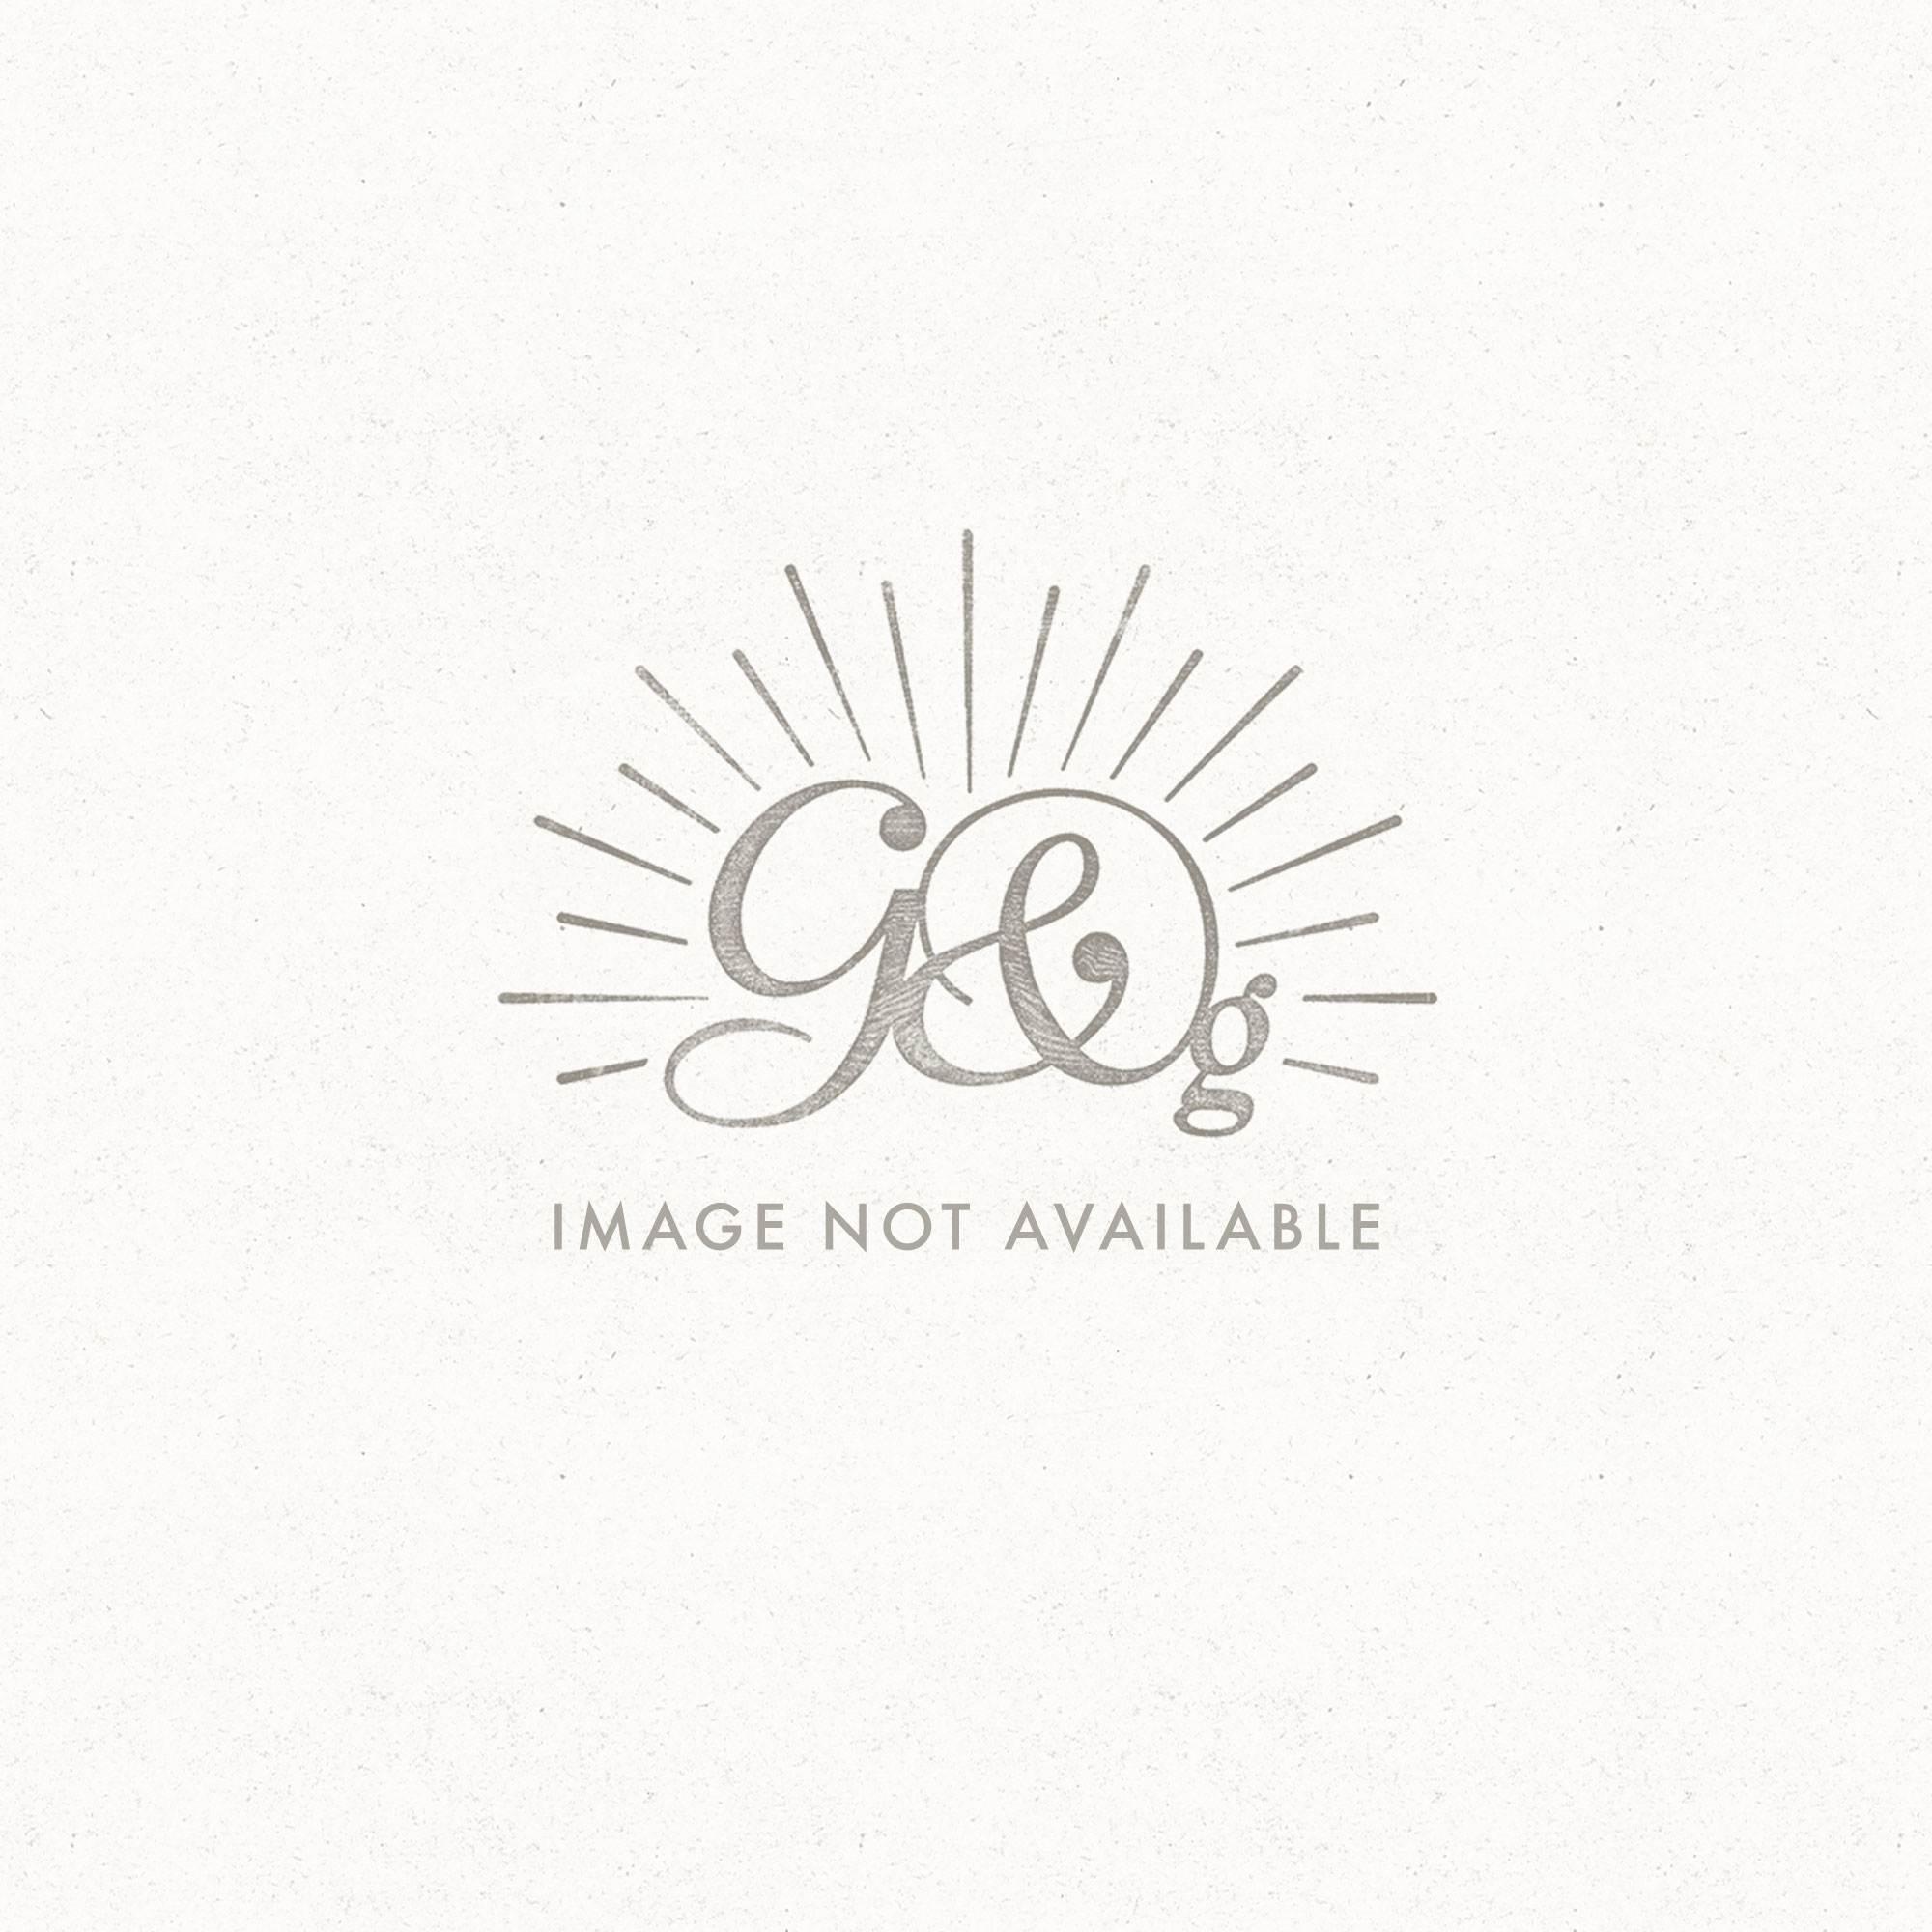 Ivory Rose Knob | Door Knobs & Handles | Graham & Green